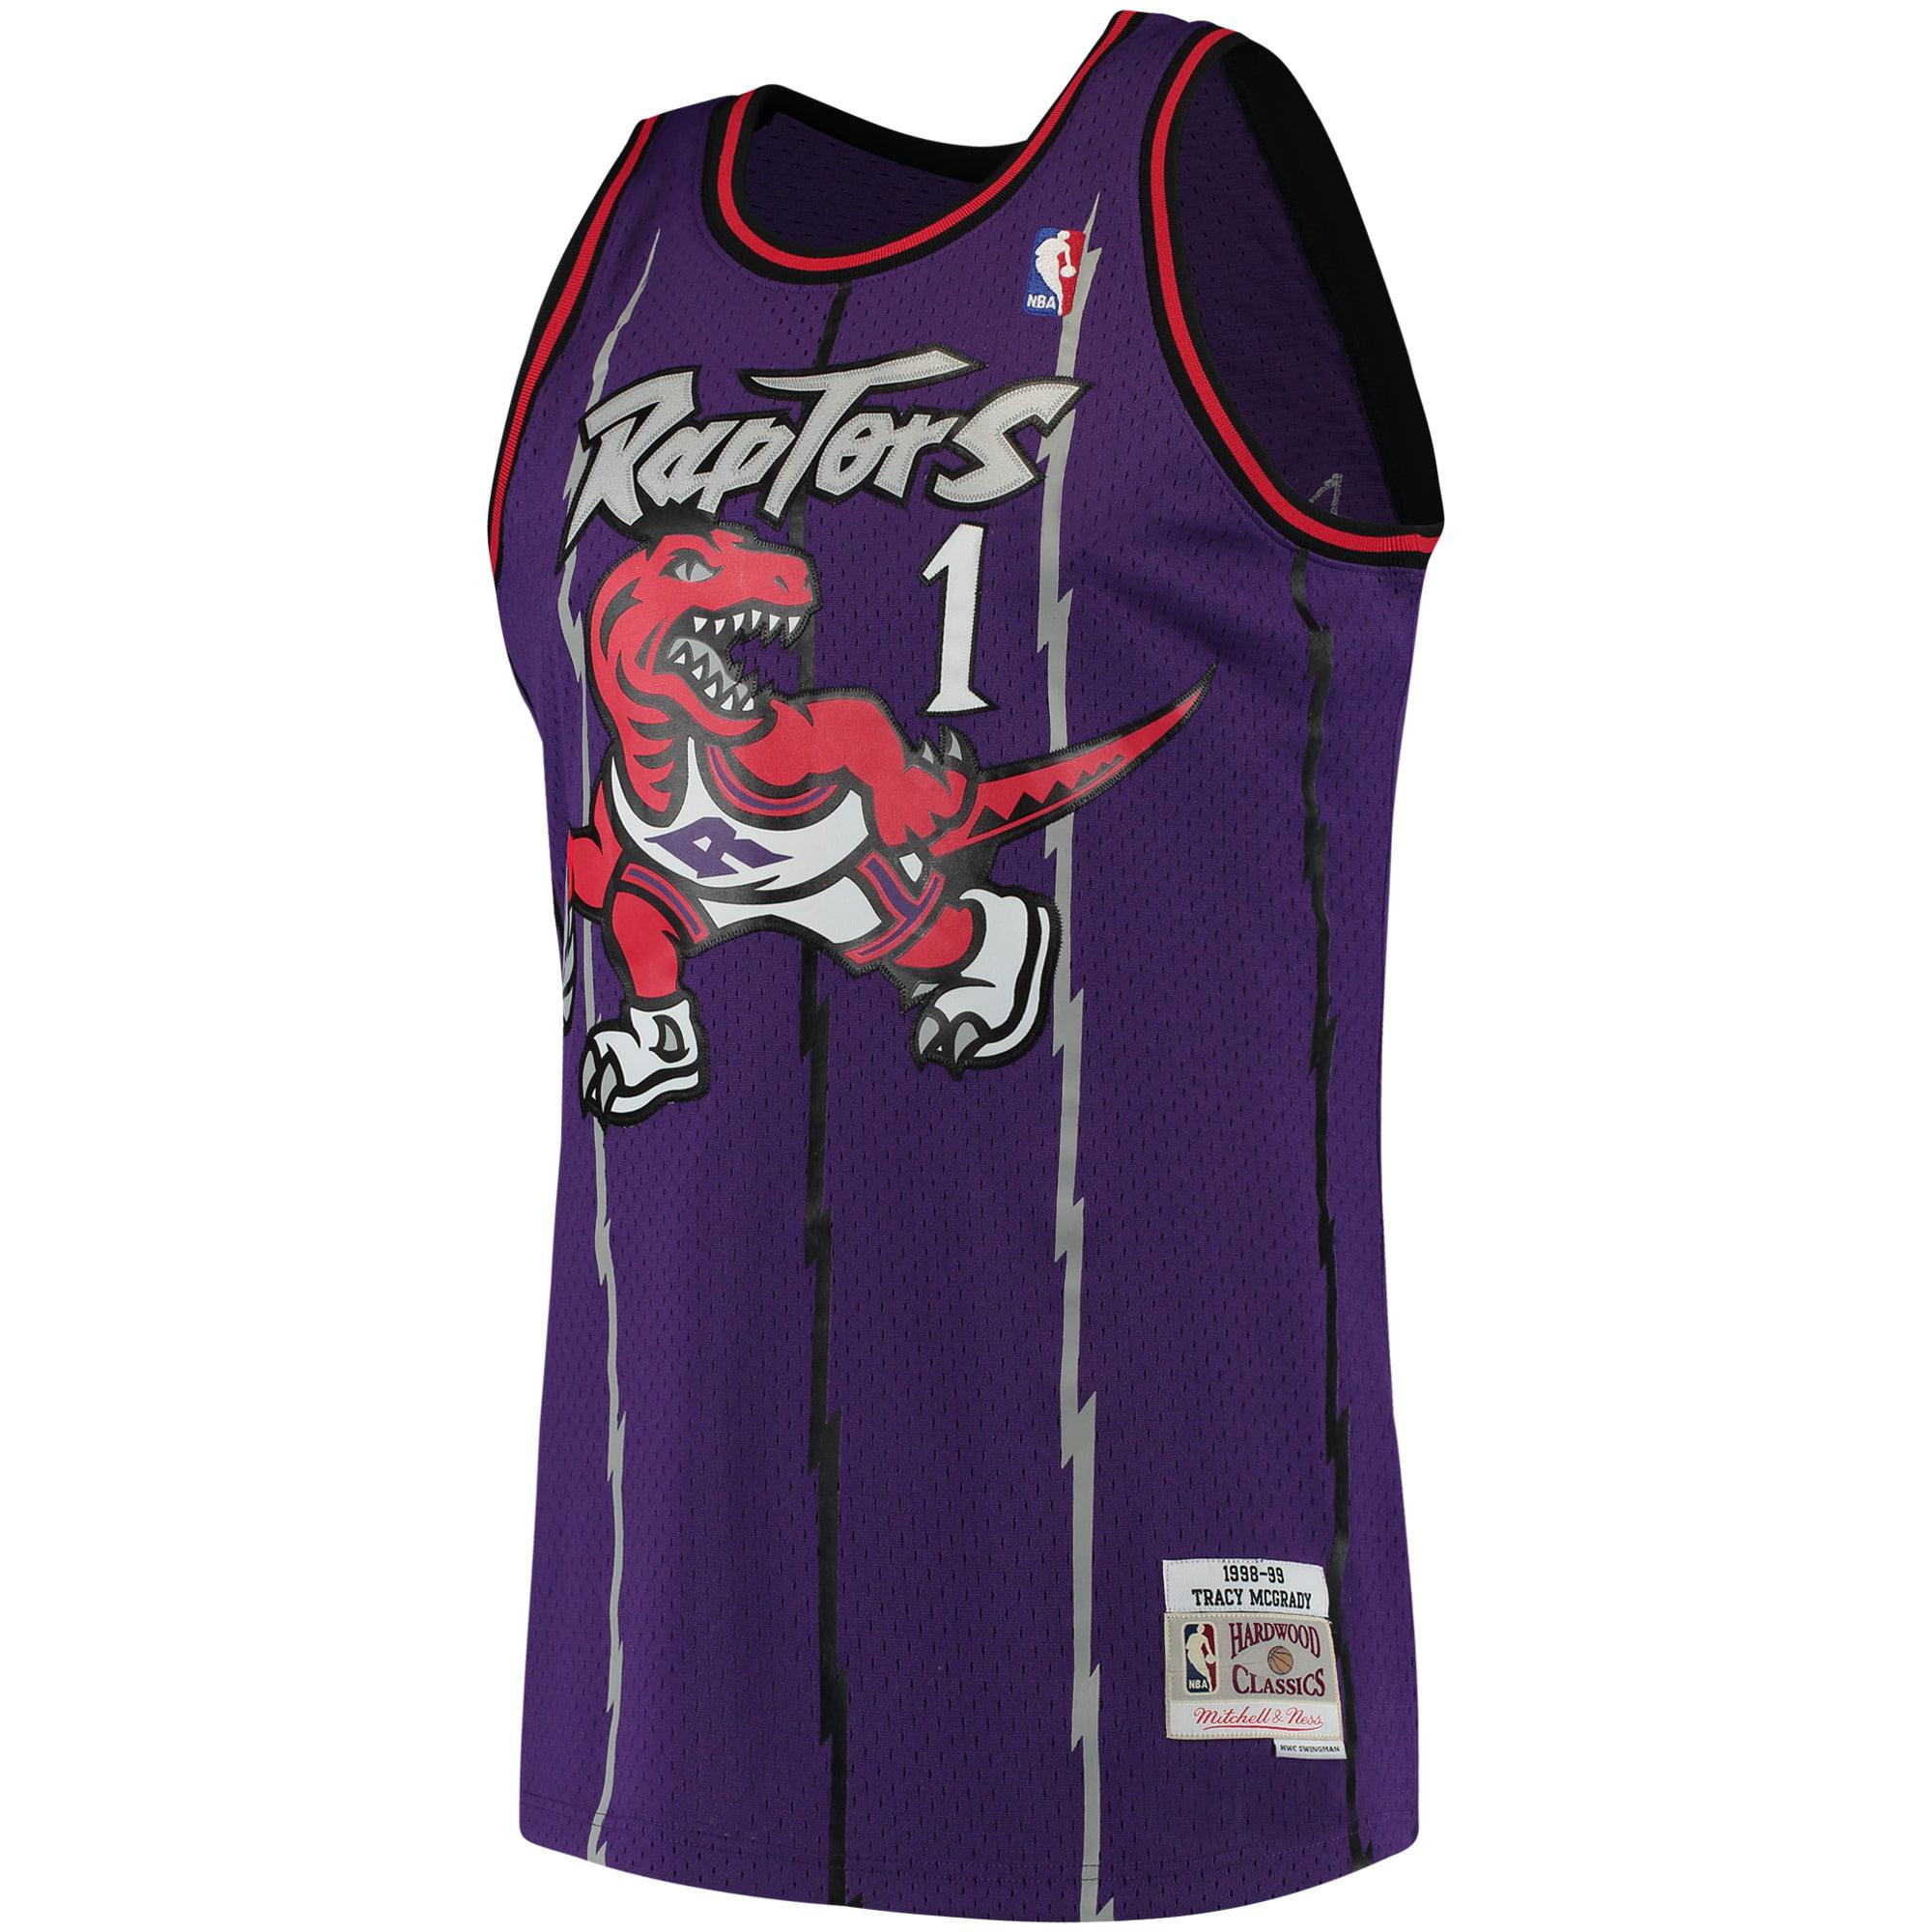 81e304dc3 Tracy McGrady Toronto Raptors Mitchell   Ness 1998-99 Hardwood Classics Swingman  Jersey - Purple - Walmart.com